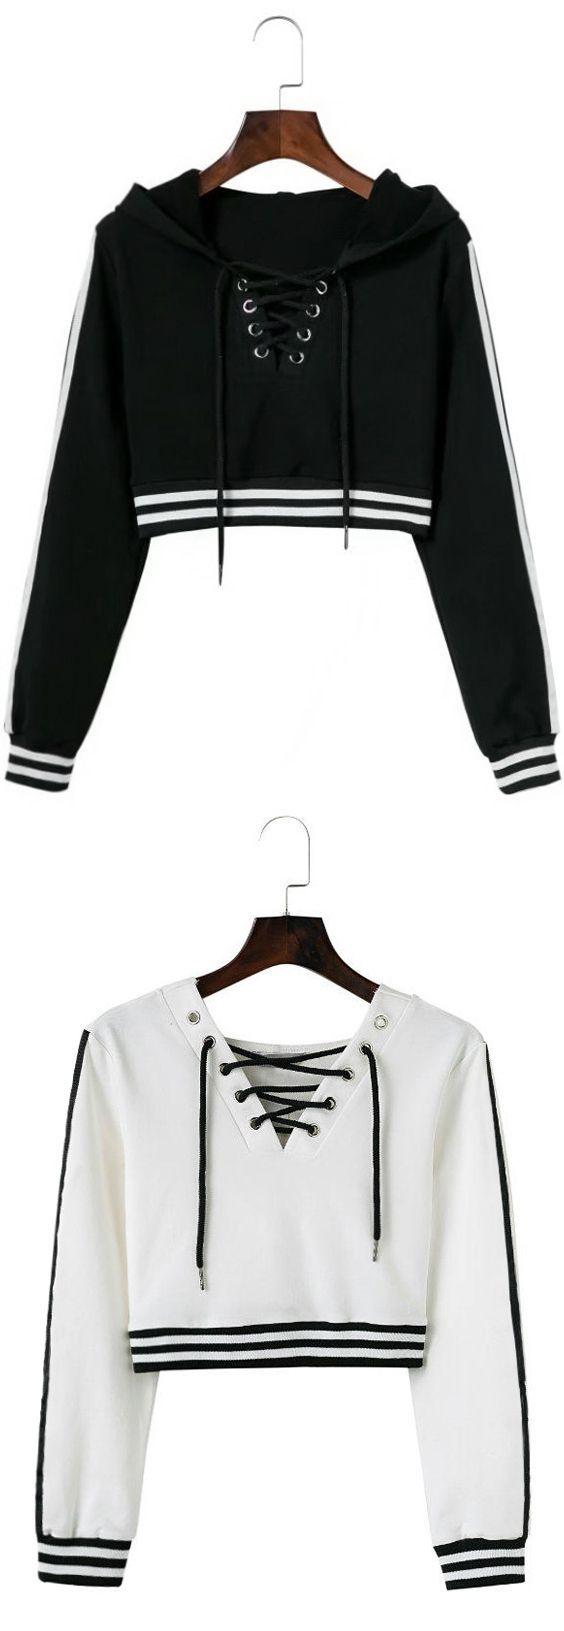 Up to 80% OFF!  Lace Up Striped Cropped Hoodie. Zaful,zaful.com,zaful fashion,tops,womens tops,outerwear,sweatshirts,hoodies,hoodies outfit,hoodies for teens,sweatshirts outfit,long sleeve tops,sweatshirts for teens,winter outfits,fall outfits,tops,sweatshirts for women,women's hoodies,womens sweatshirts,crop top hoodie,cute sweatshirts,floral hoodie,crop hoodies,designer hoodies,oversized sweatshirt @zaful Extra 10% OFF Code:ZF2017 #fashionhoodieswomens